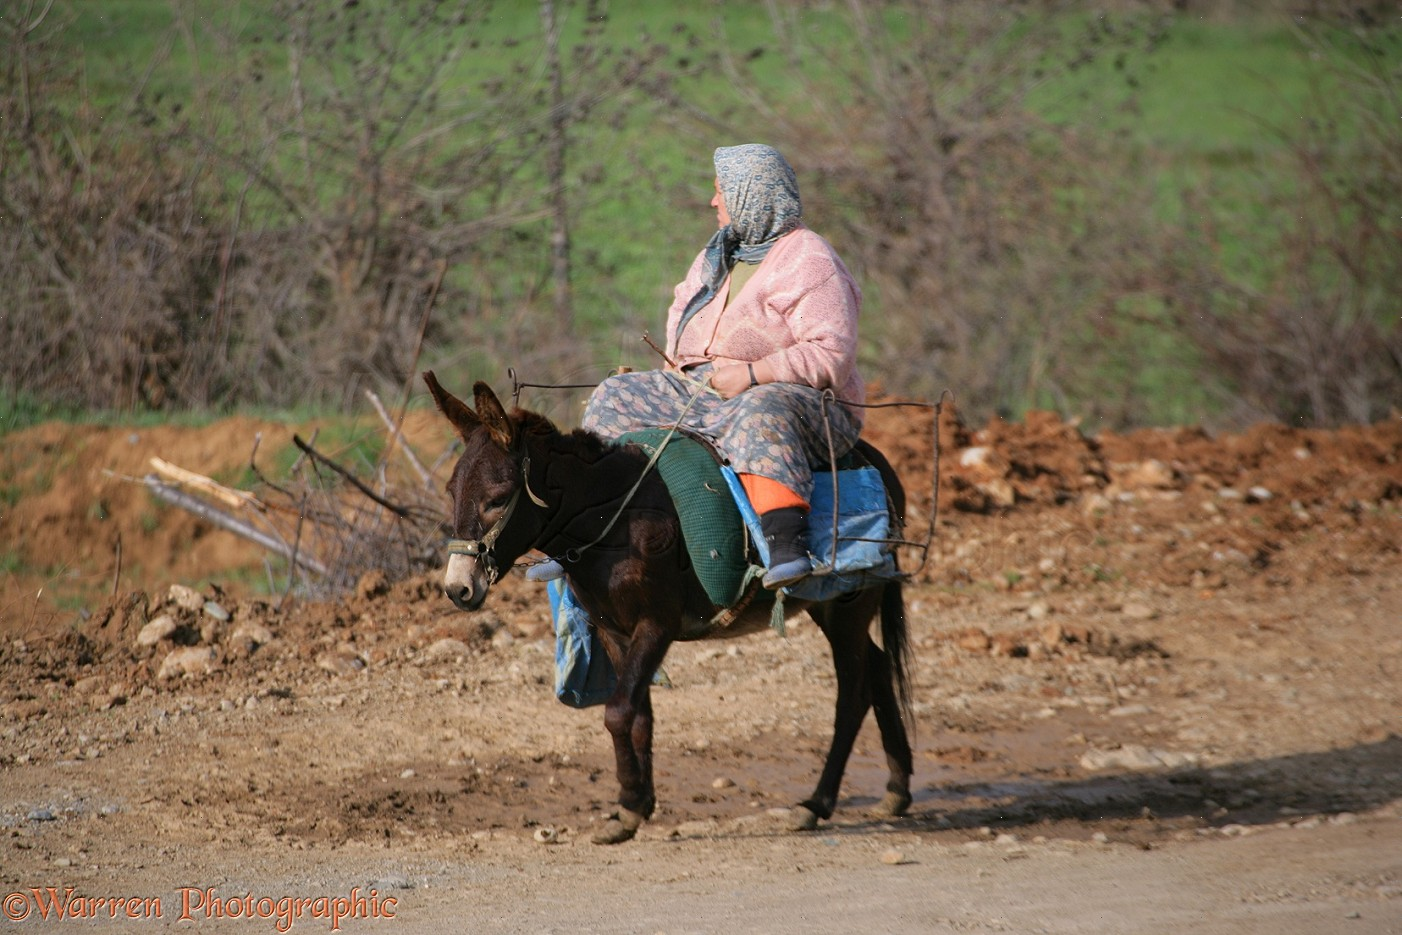 WP12158 Woman on a donkey. Cicekpinar, Turkey.